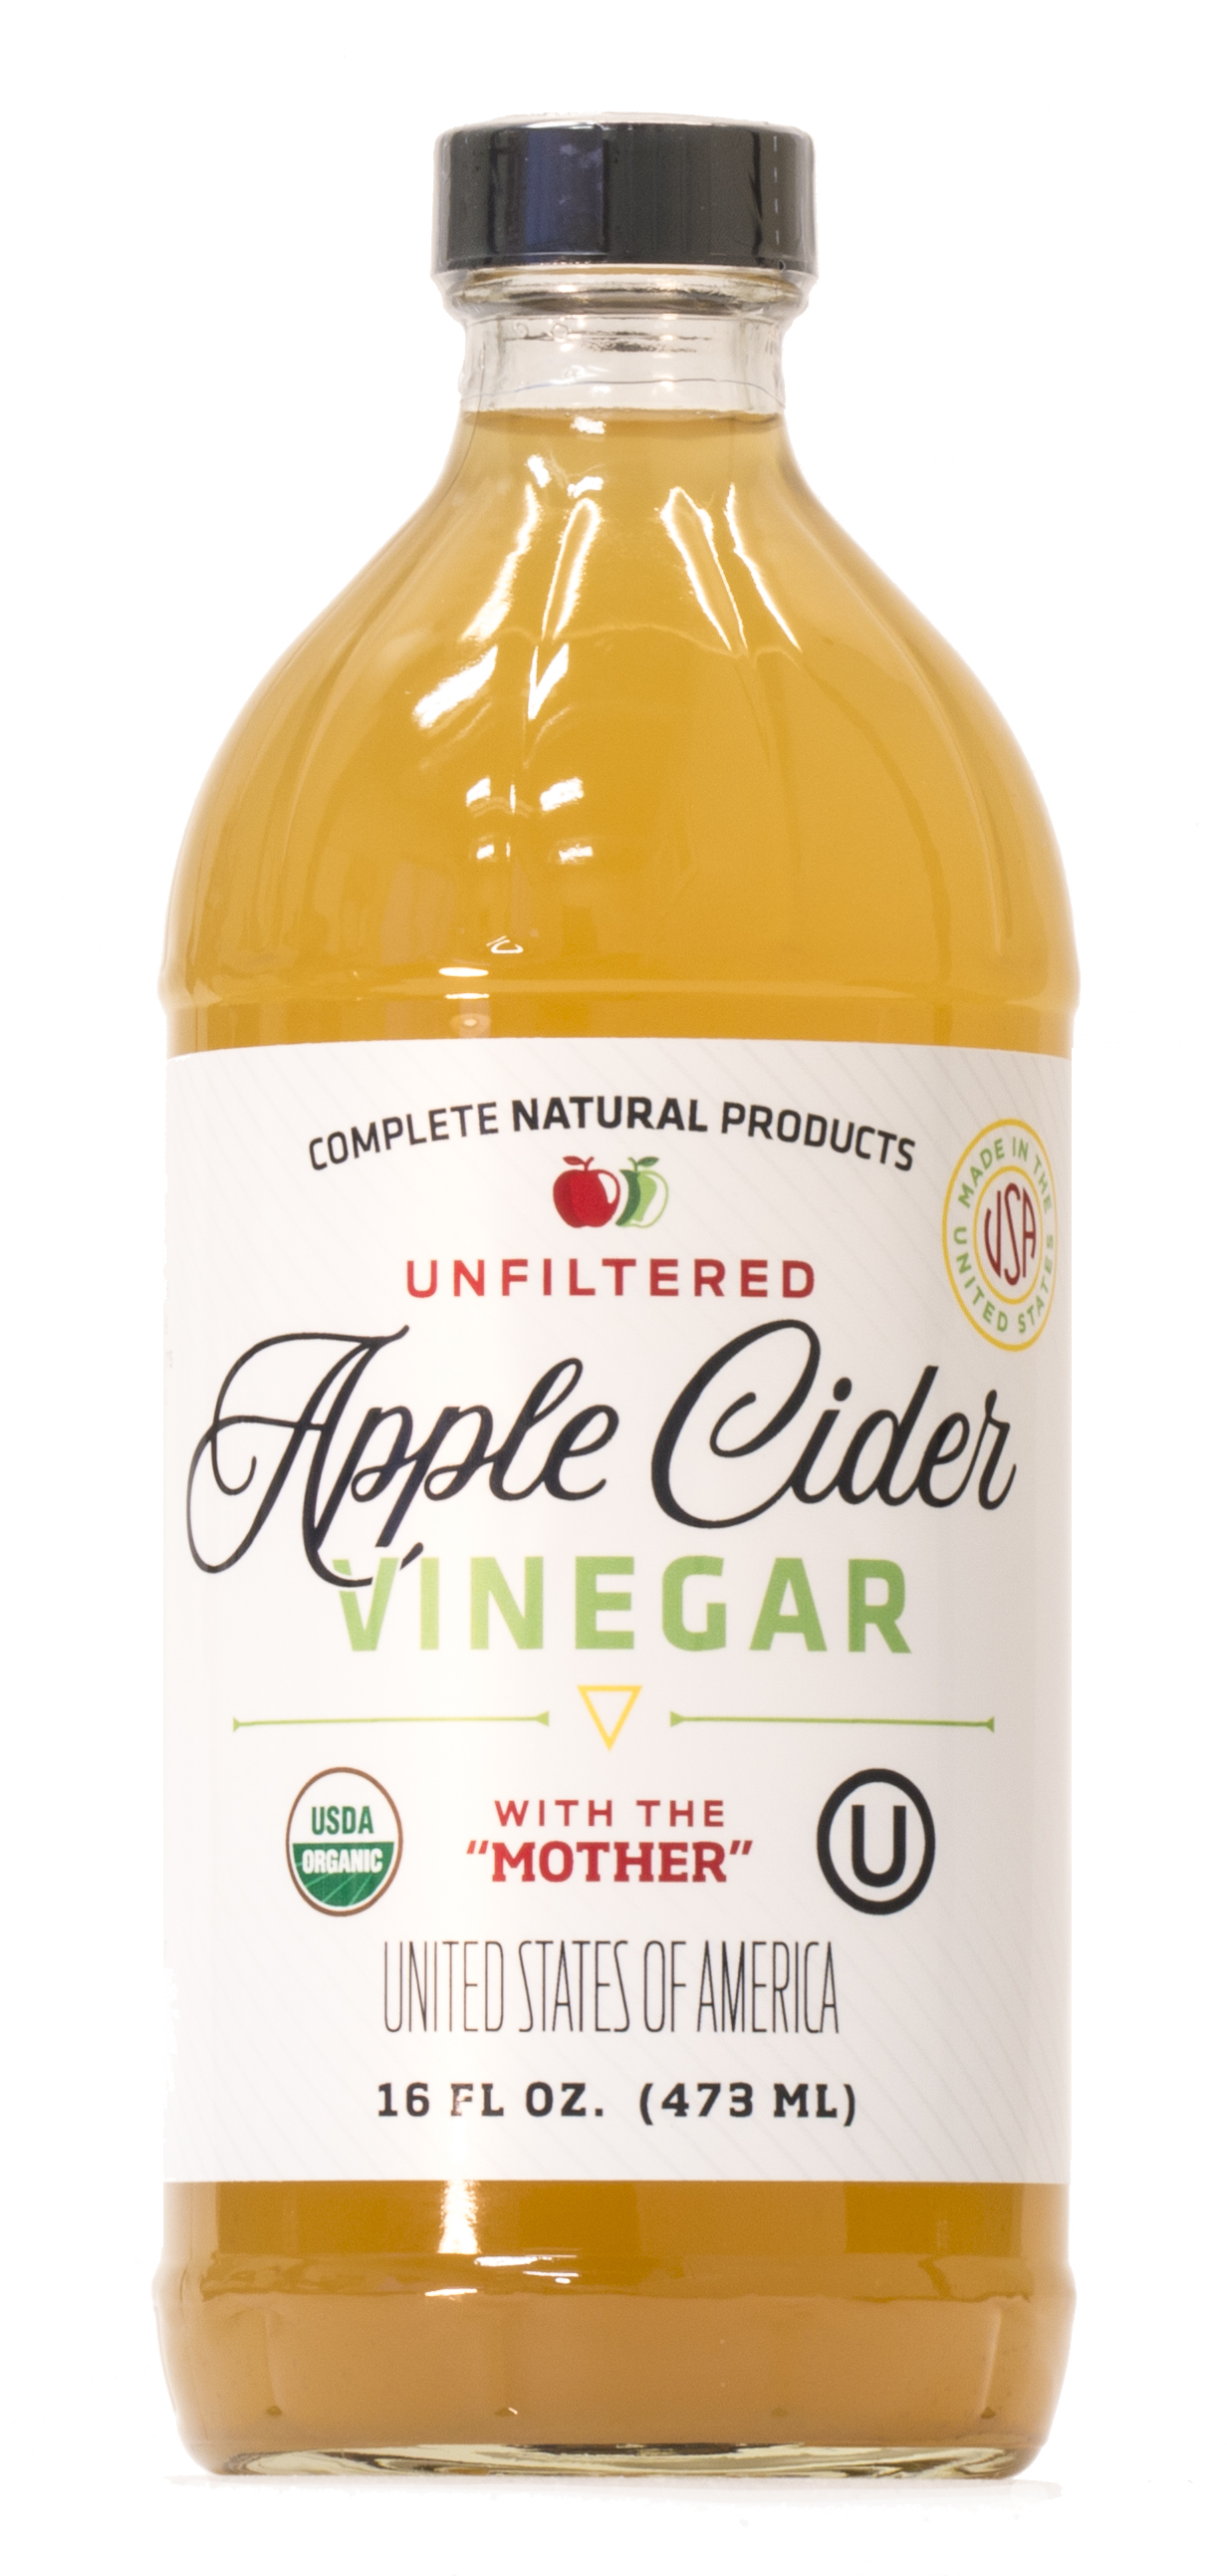 Details about Apple Cider Vinegar 16oz - Unfiltered, Kosher, USDA Organic  with The Mother